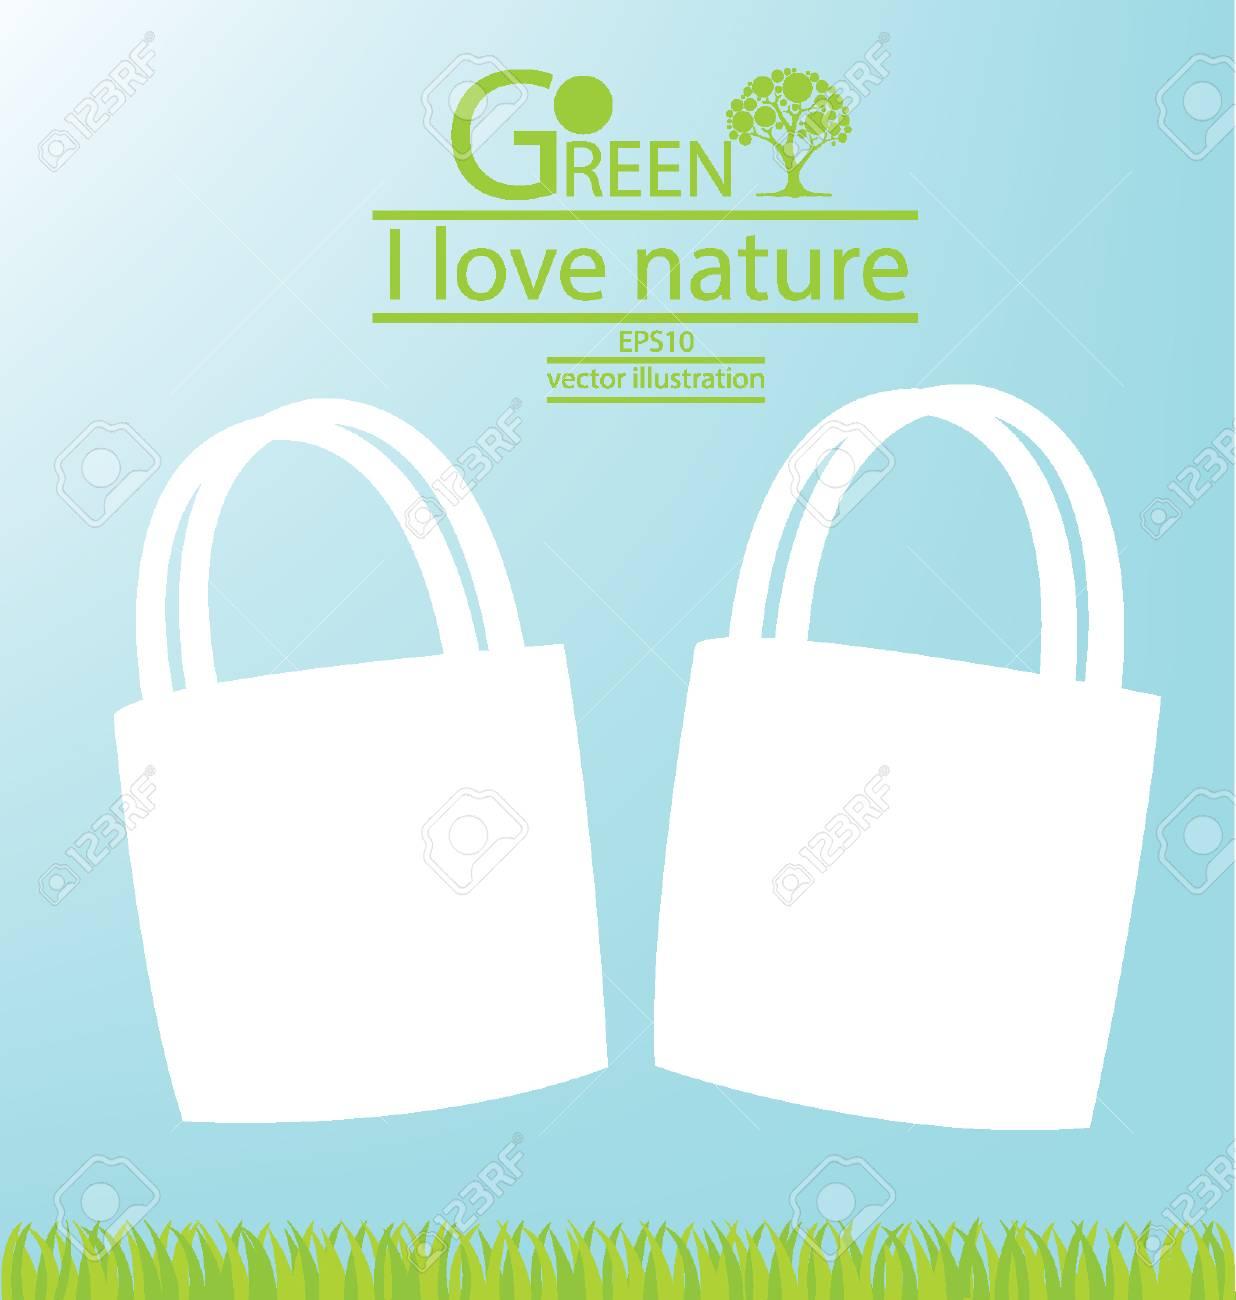 Bags, Go green, Save world vector illustration Stock Vector - 24941152